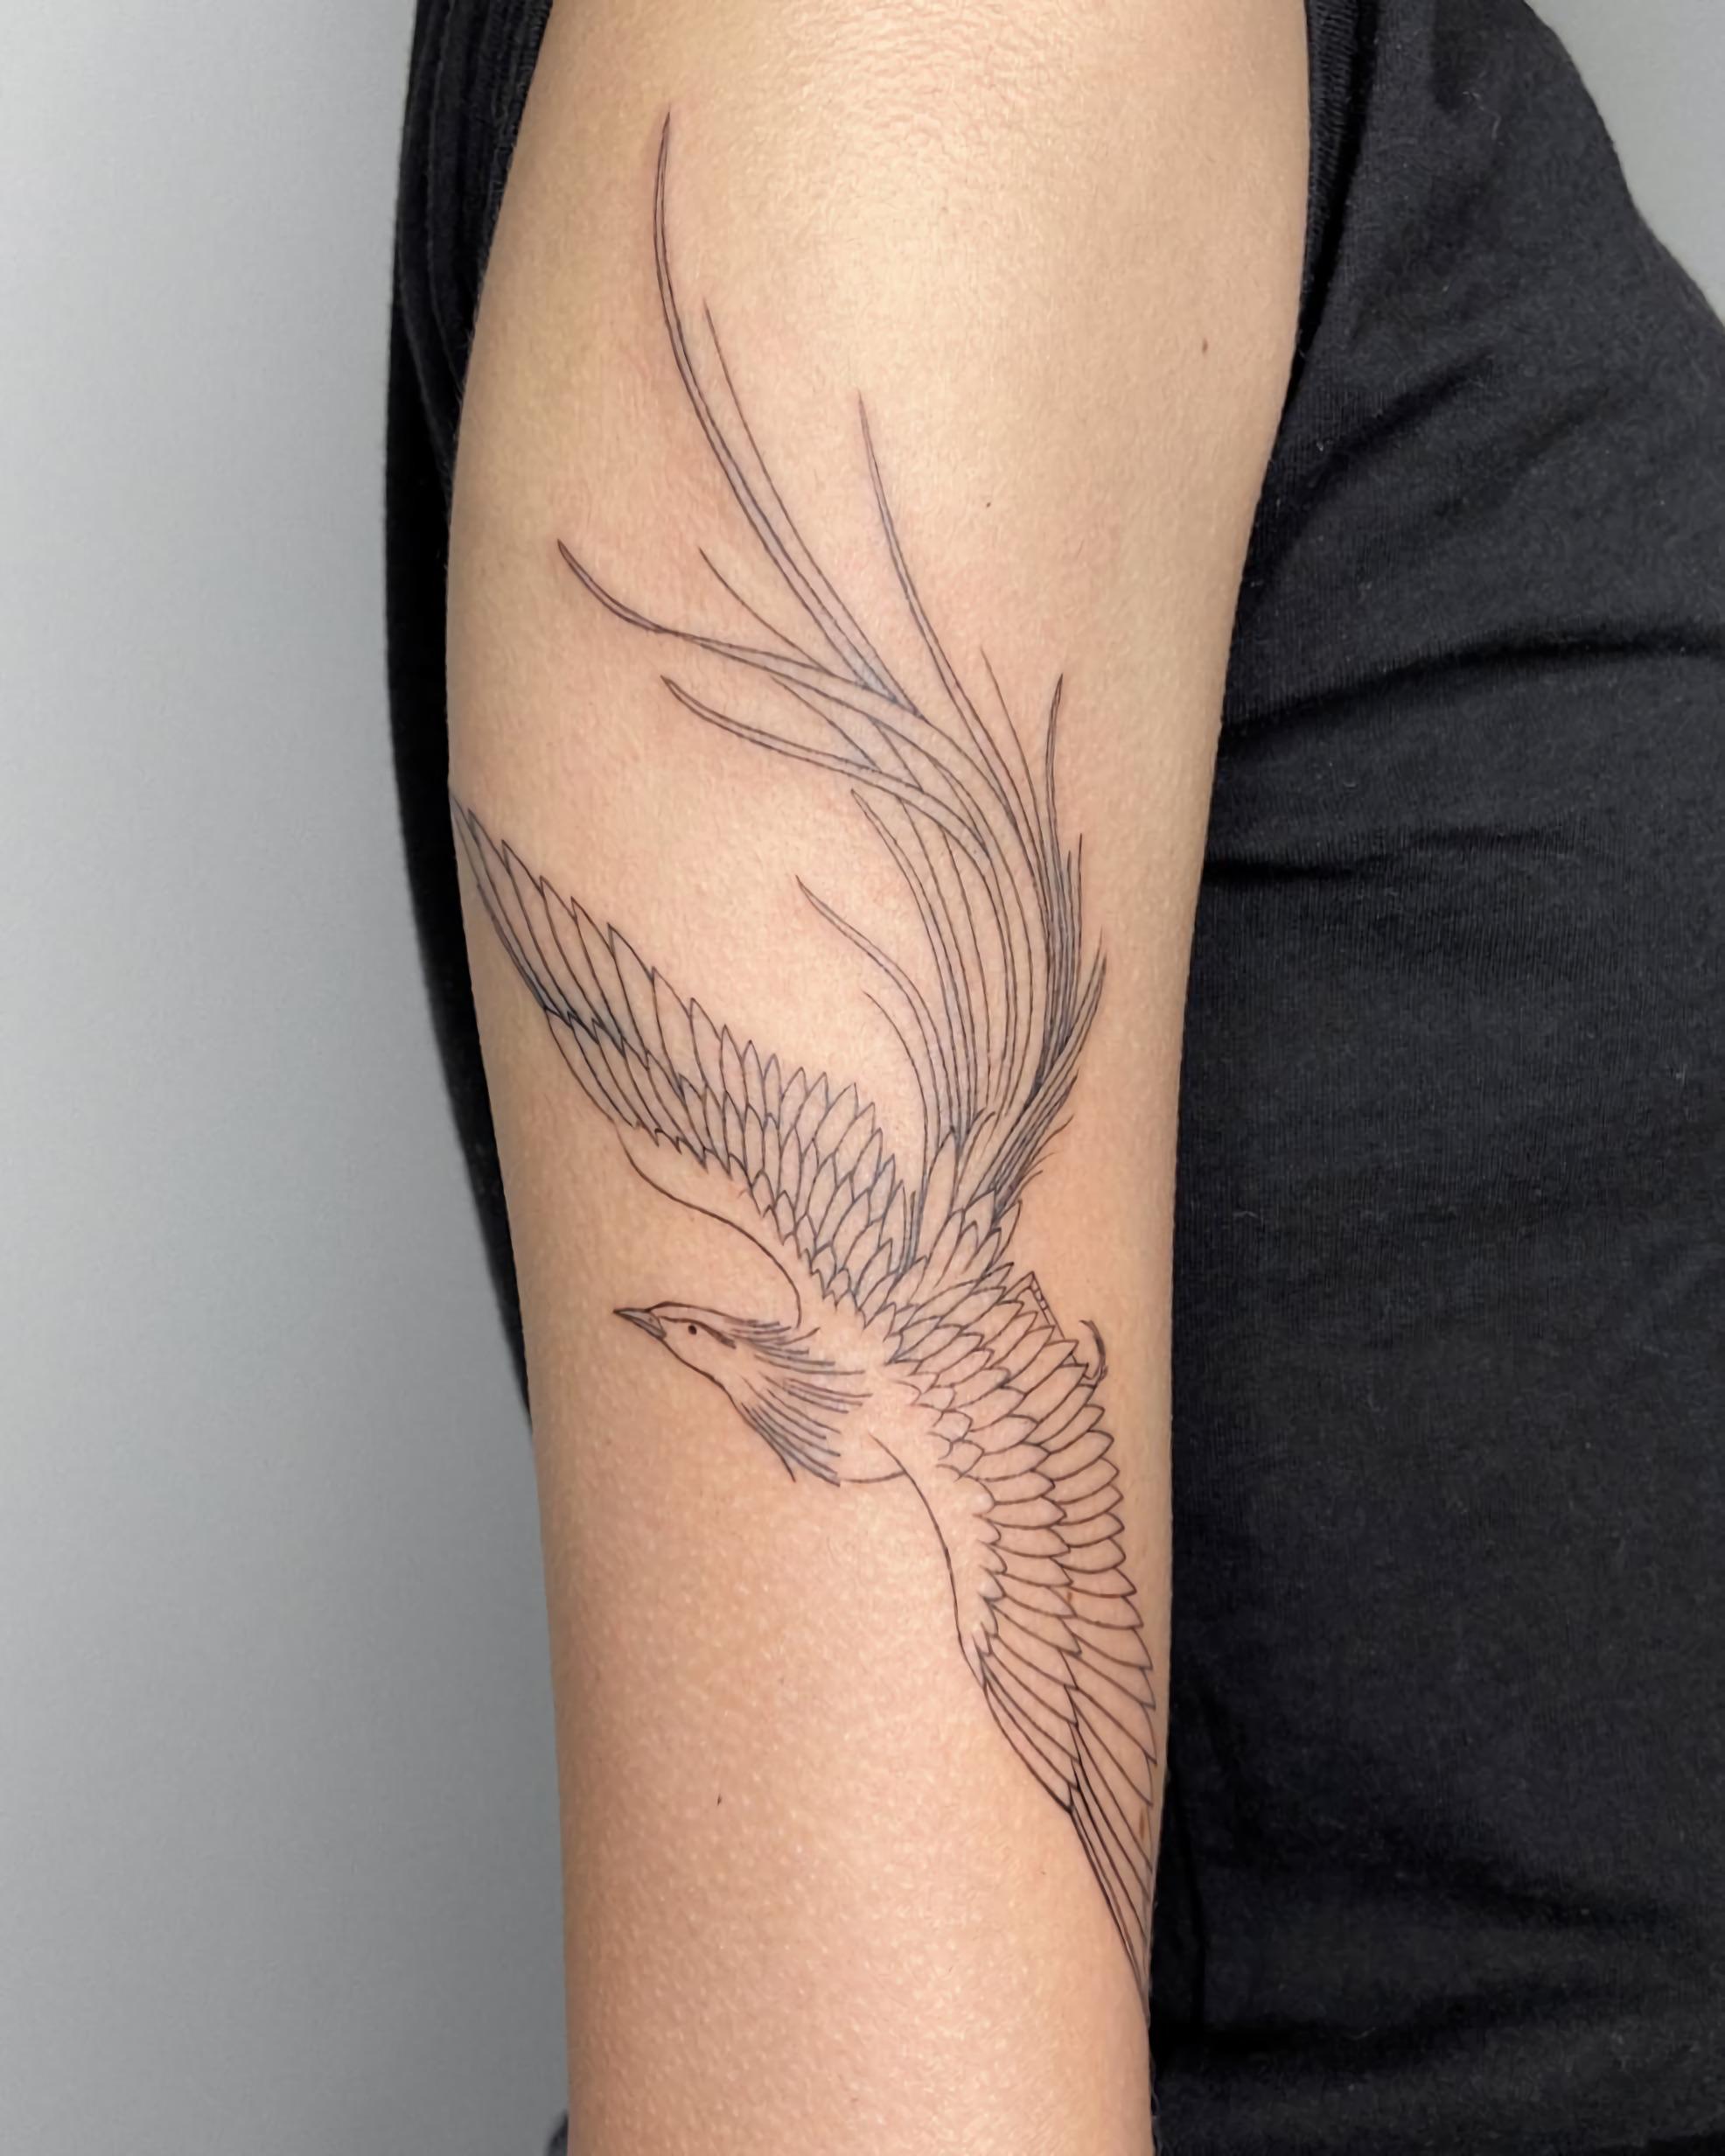 татуировка феникса на руке